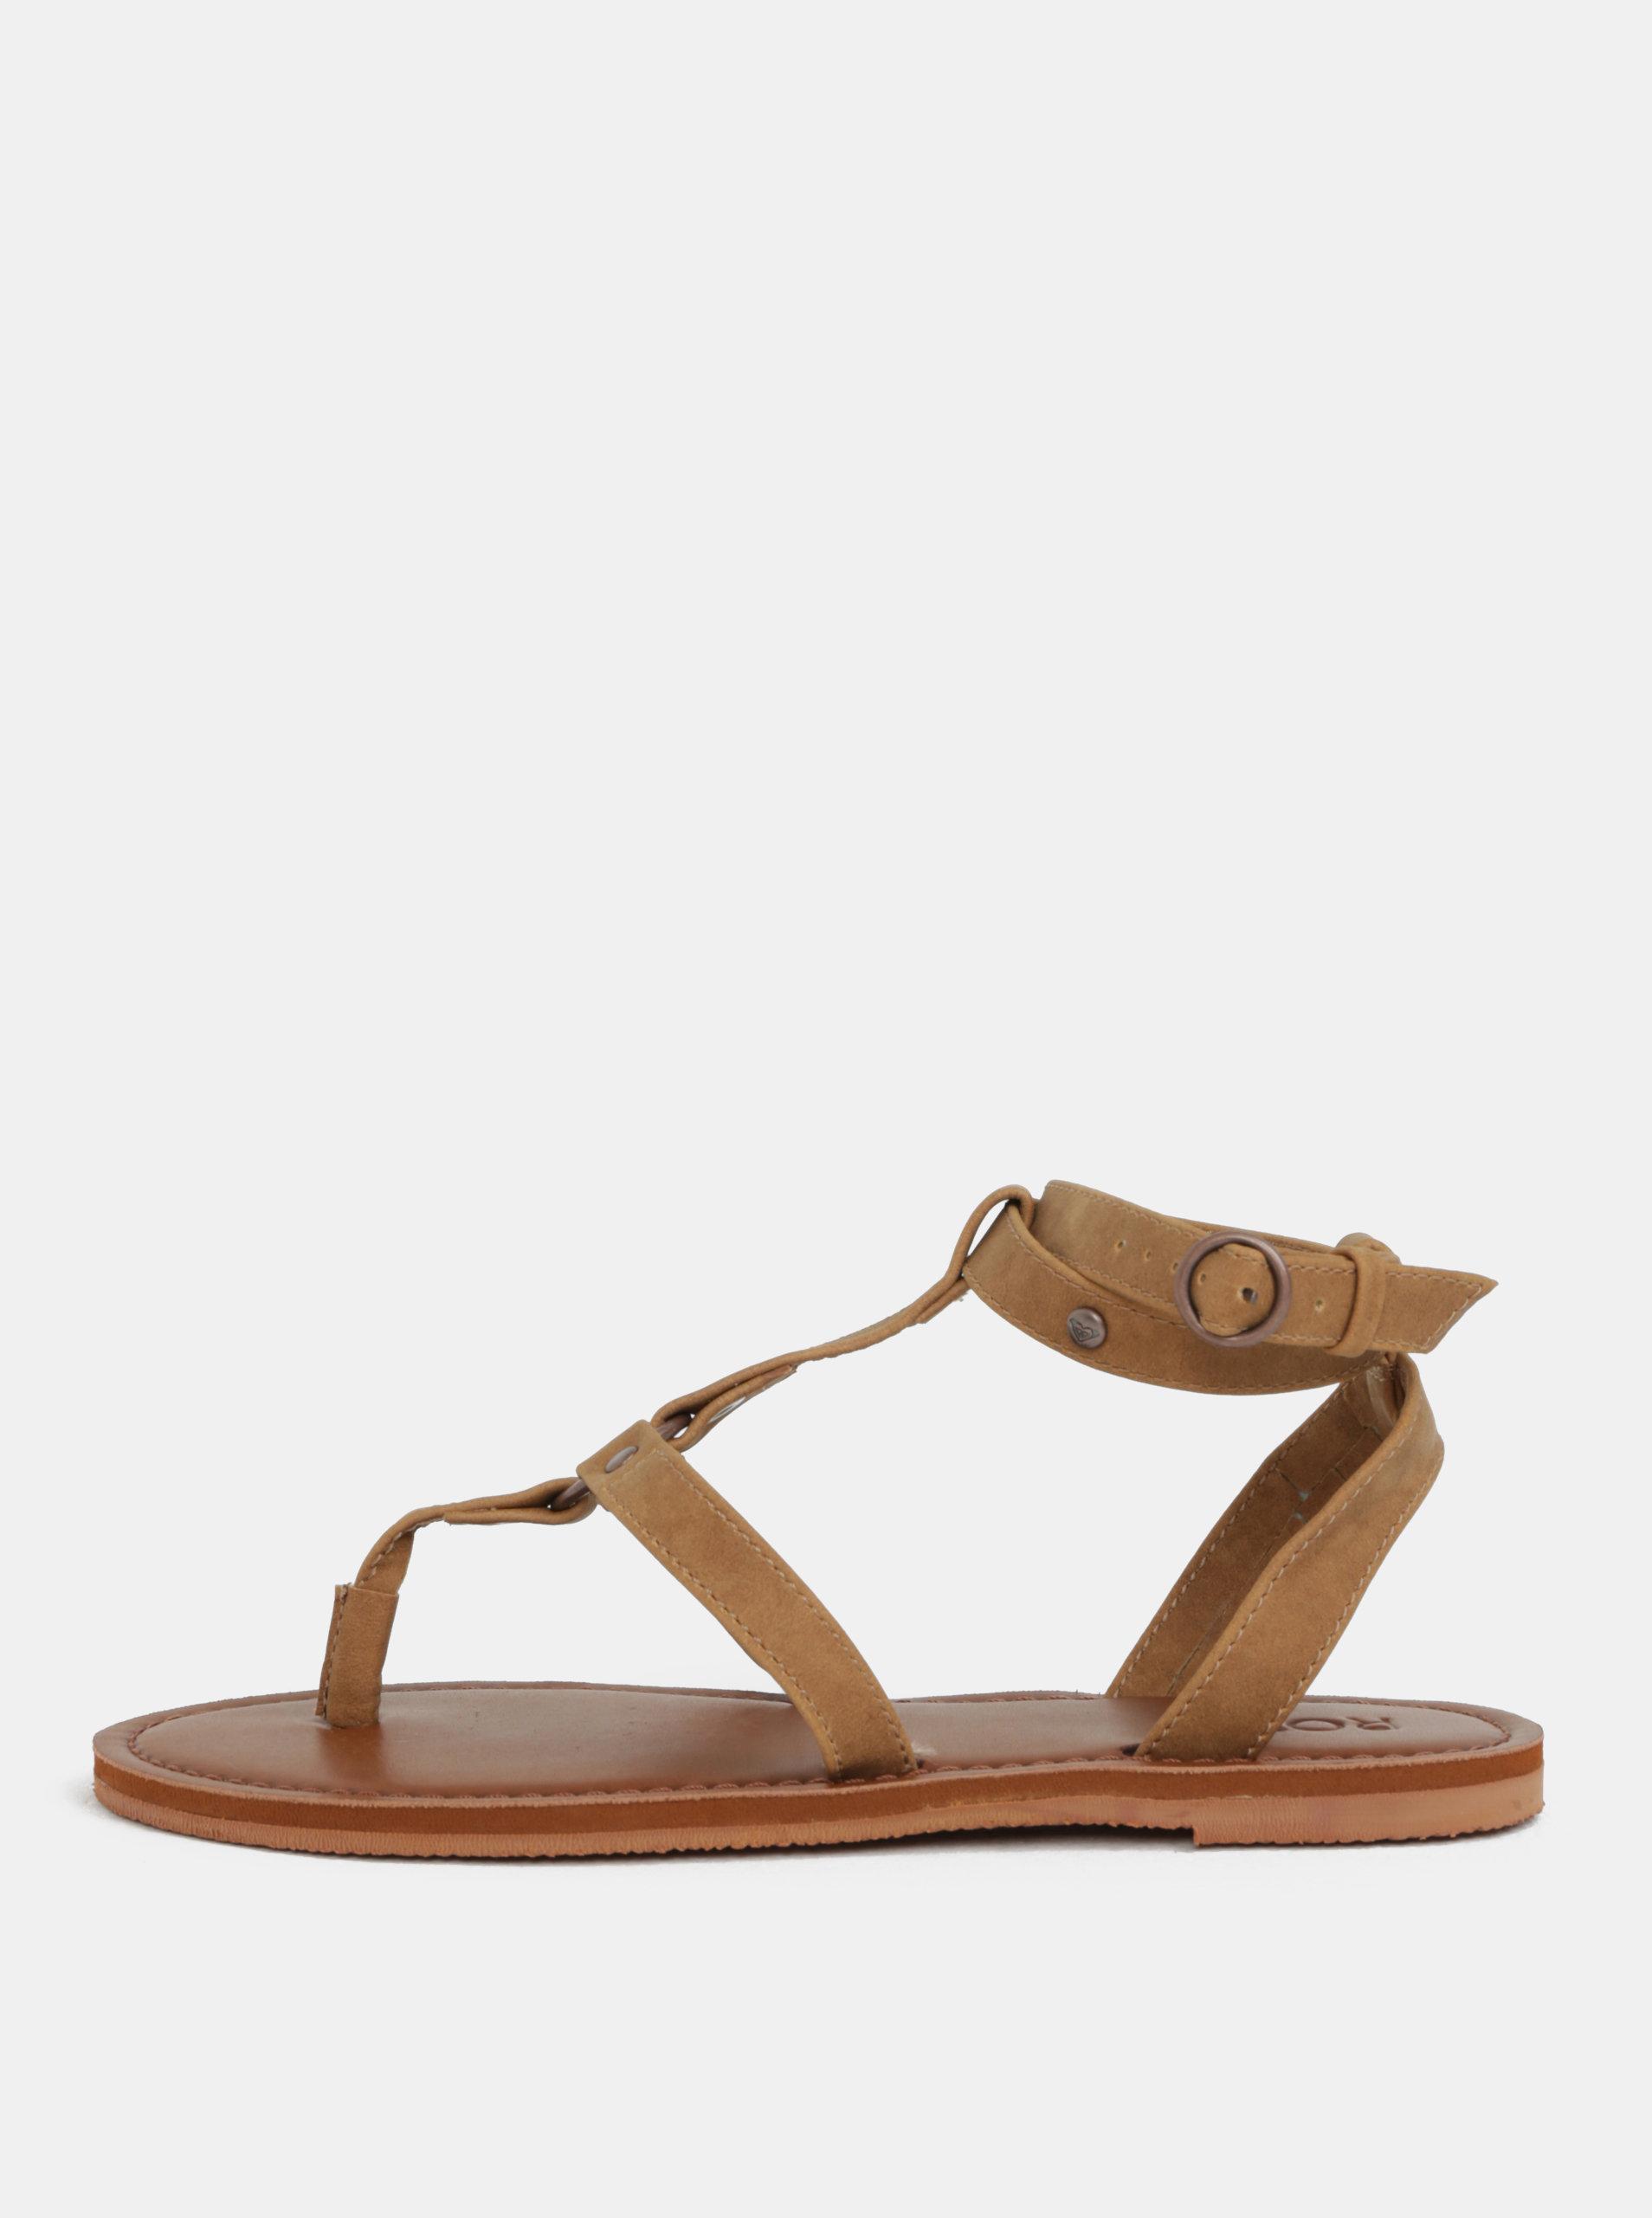 Hnedé dámske sandále Roxy Soria ... b69a4a53c1